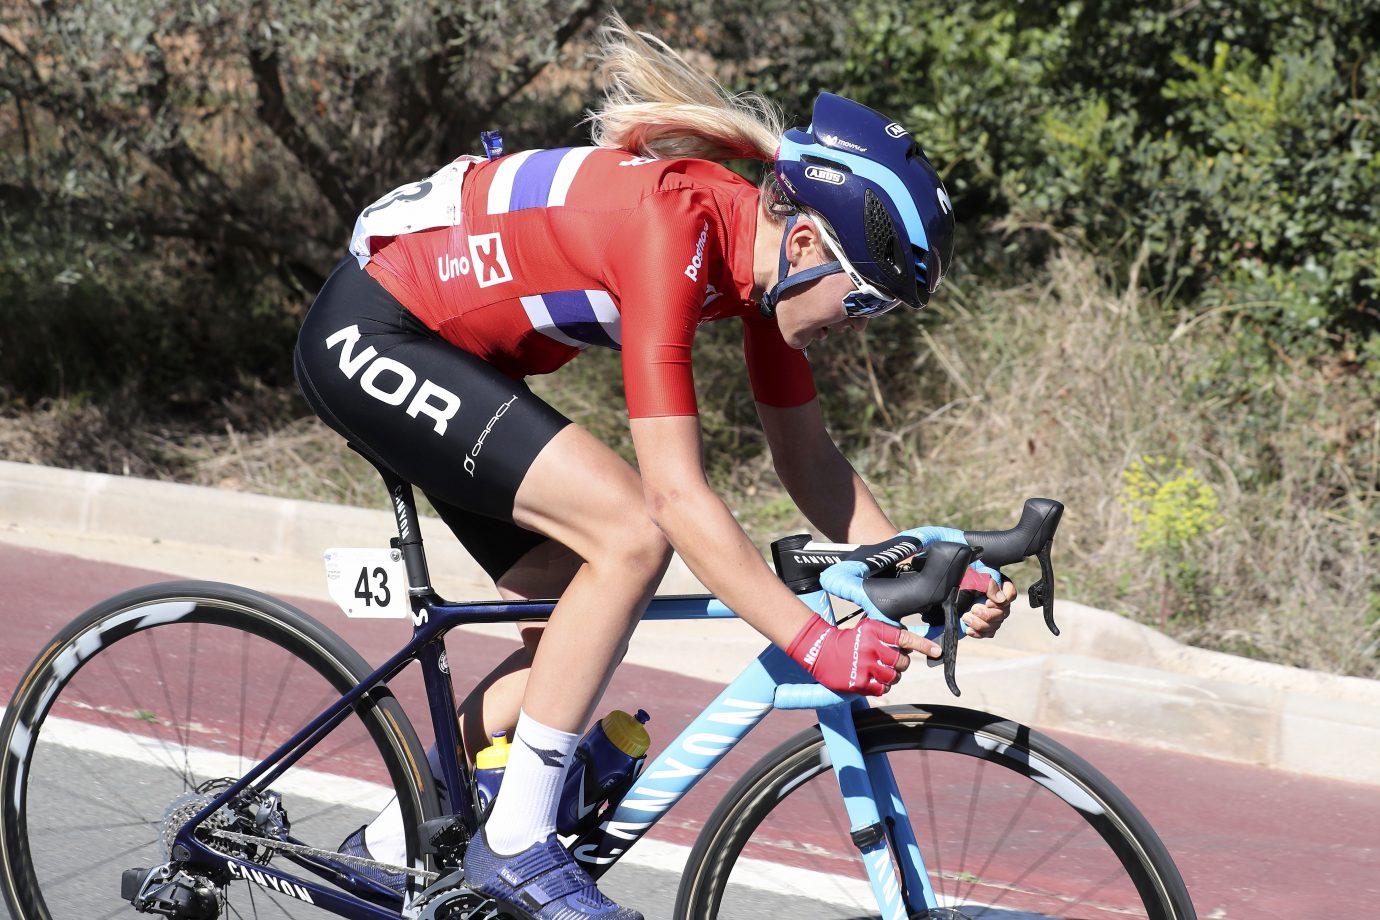 Imagen de la noticia 'Courageous Aalerud takes 9th overall in Setmana Valenciana'